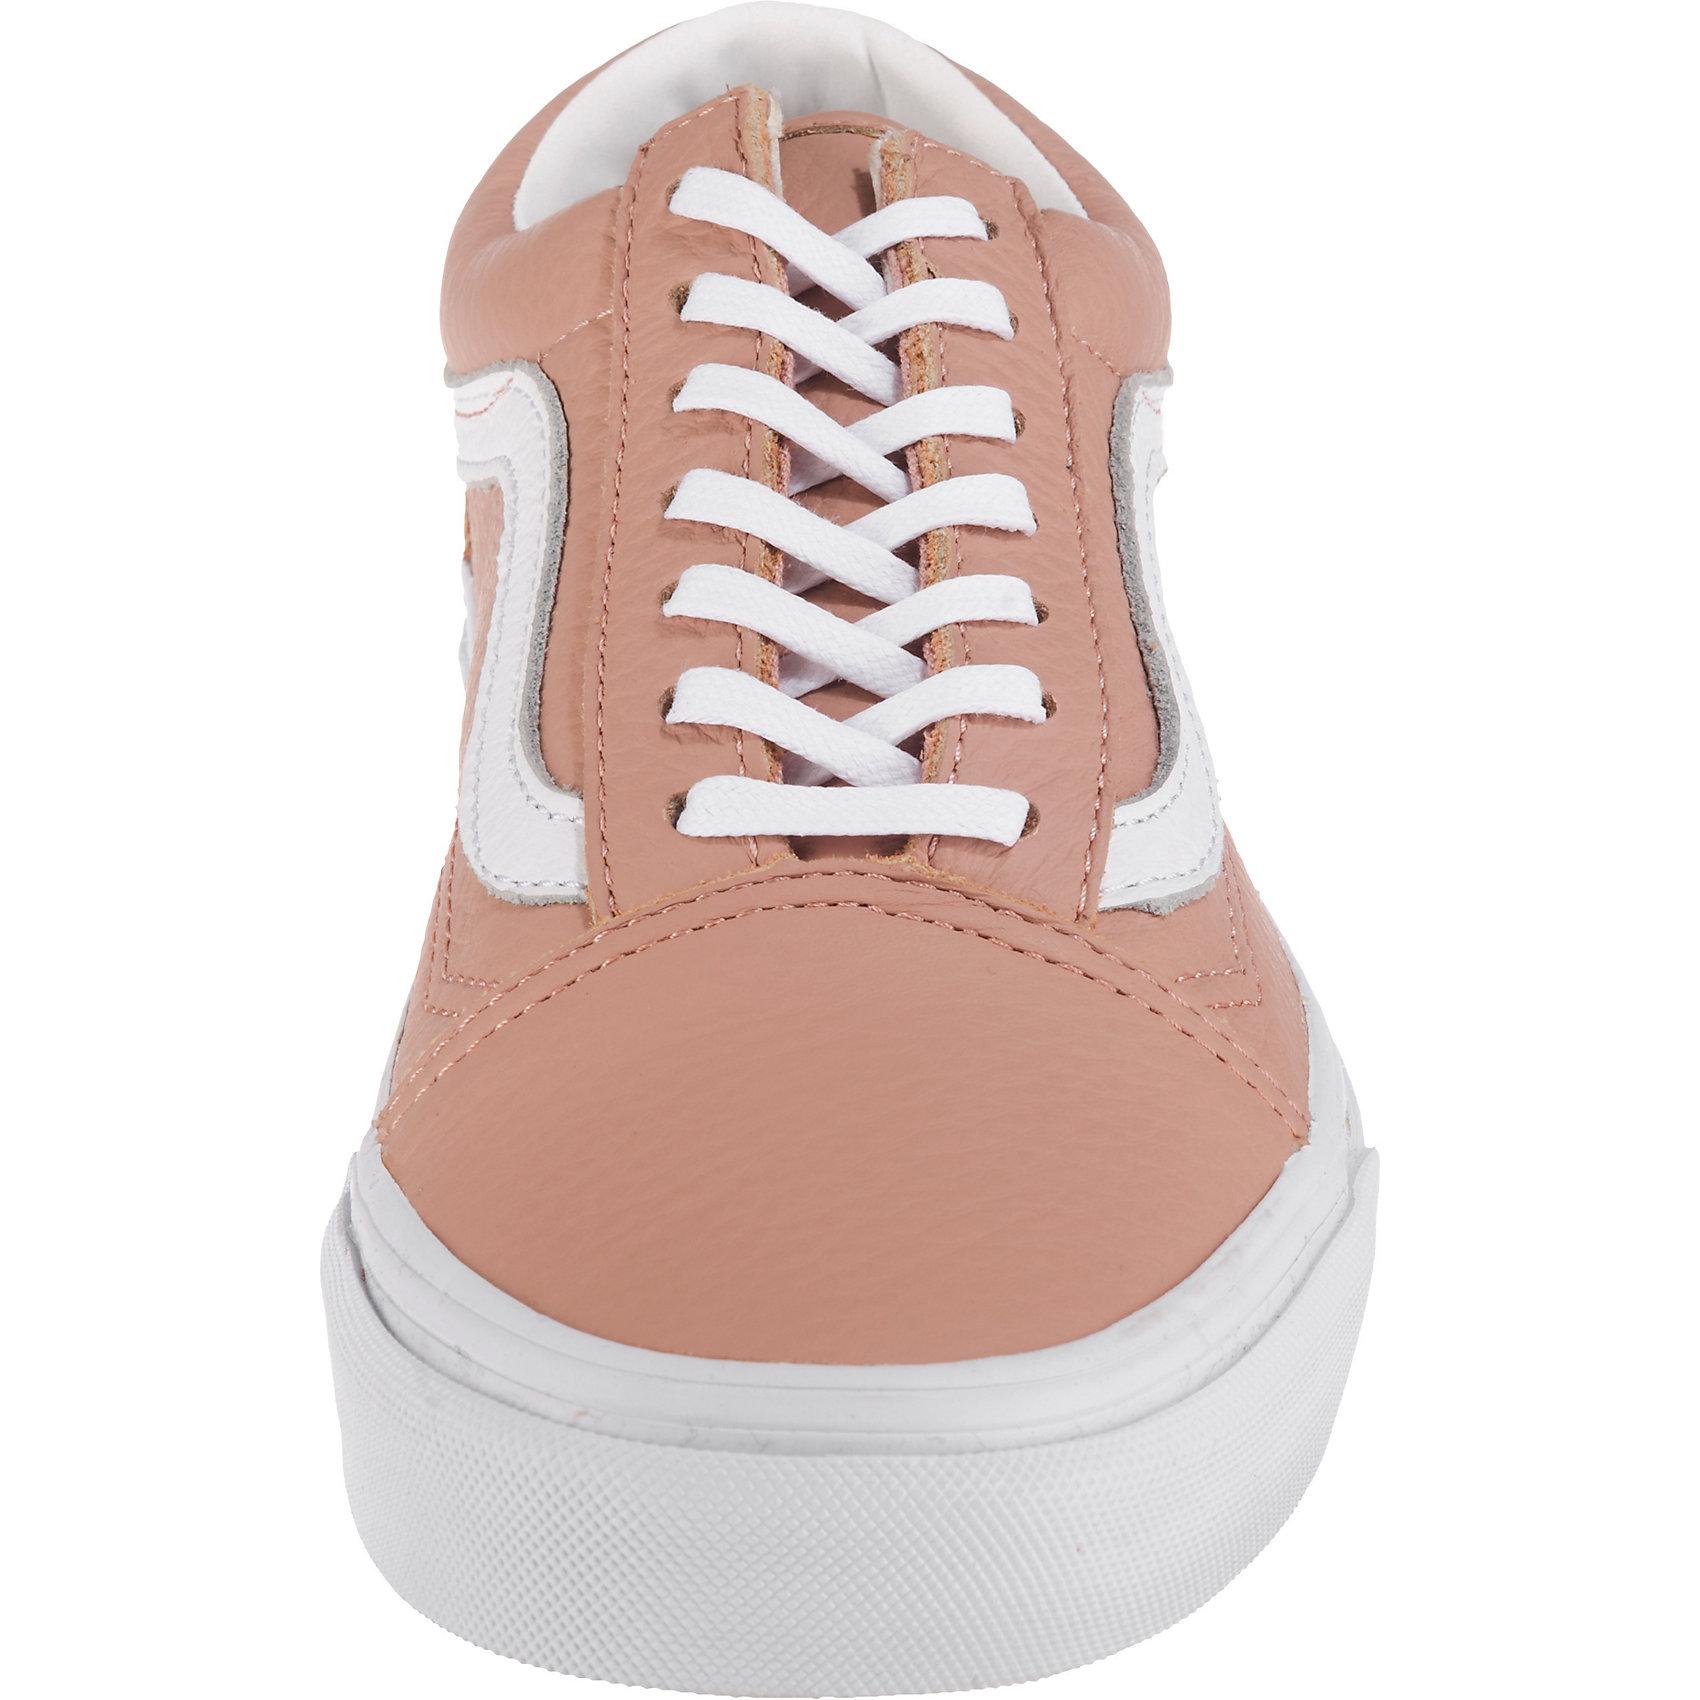 1c343bf84265 ... NIKE NIKE NIKE Men s Air Zoom LWP  16 shoes 918226-004 SIZE 11 retail  ...